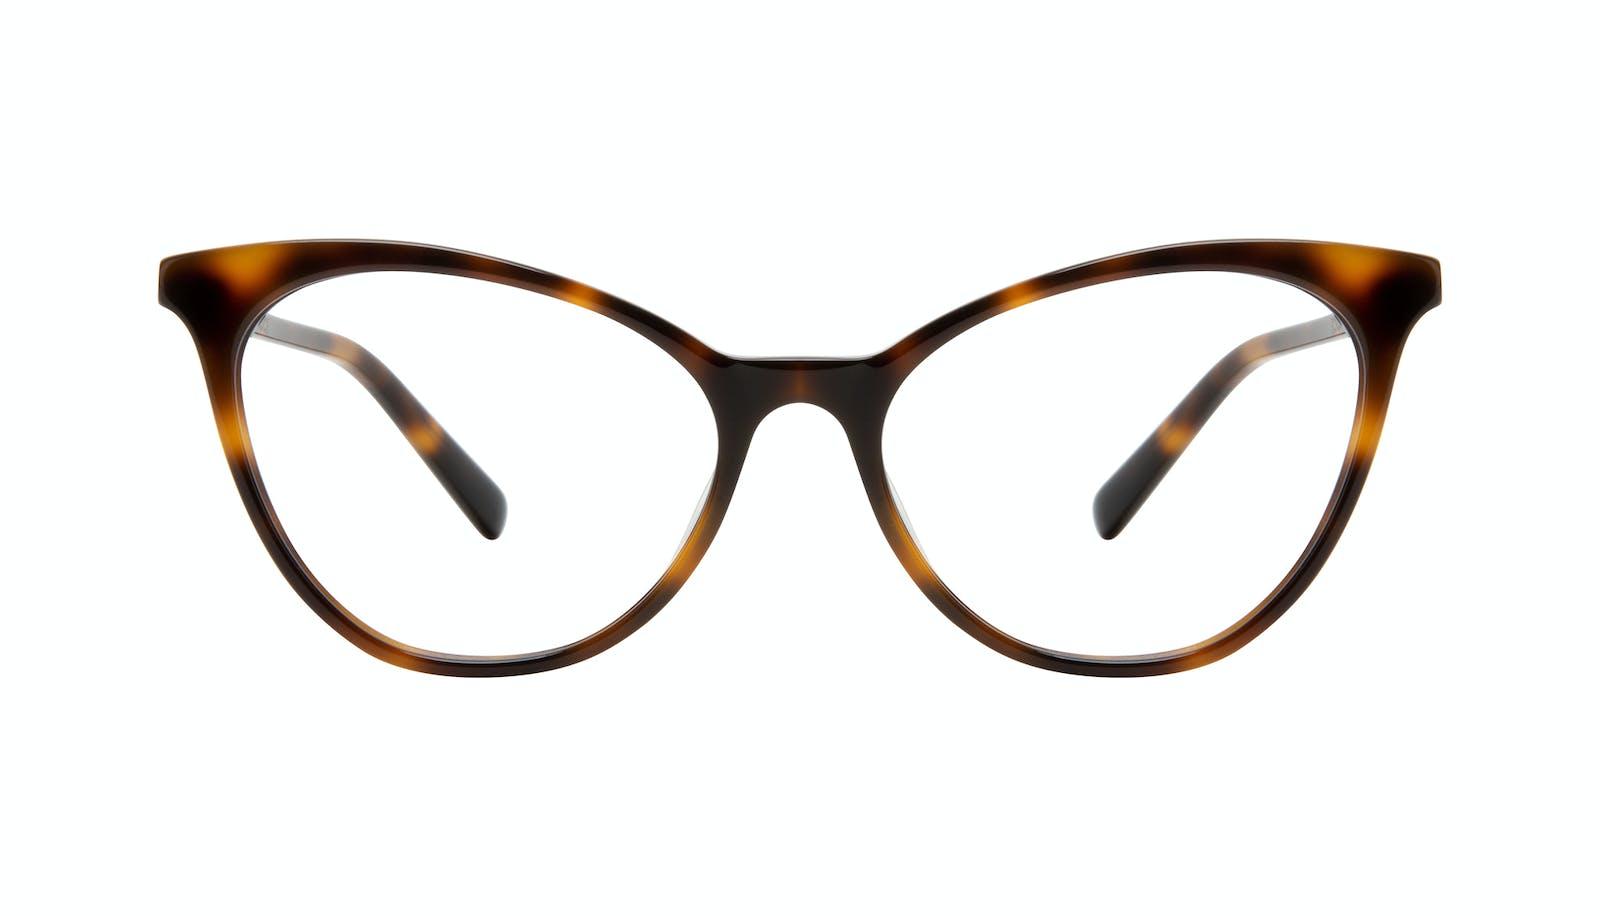 dc56d1e011 Affordable Fashion Glasses Cat Eye Eyeglasses Women Unreal Tortoise